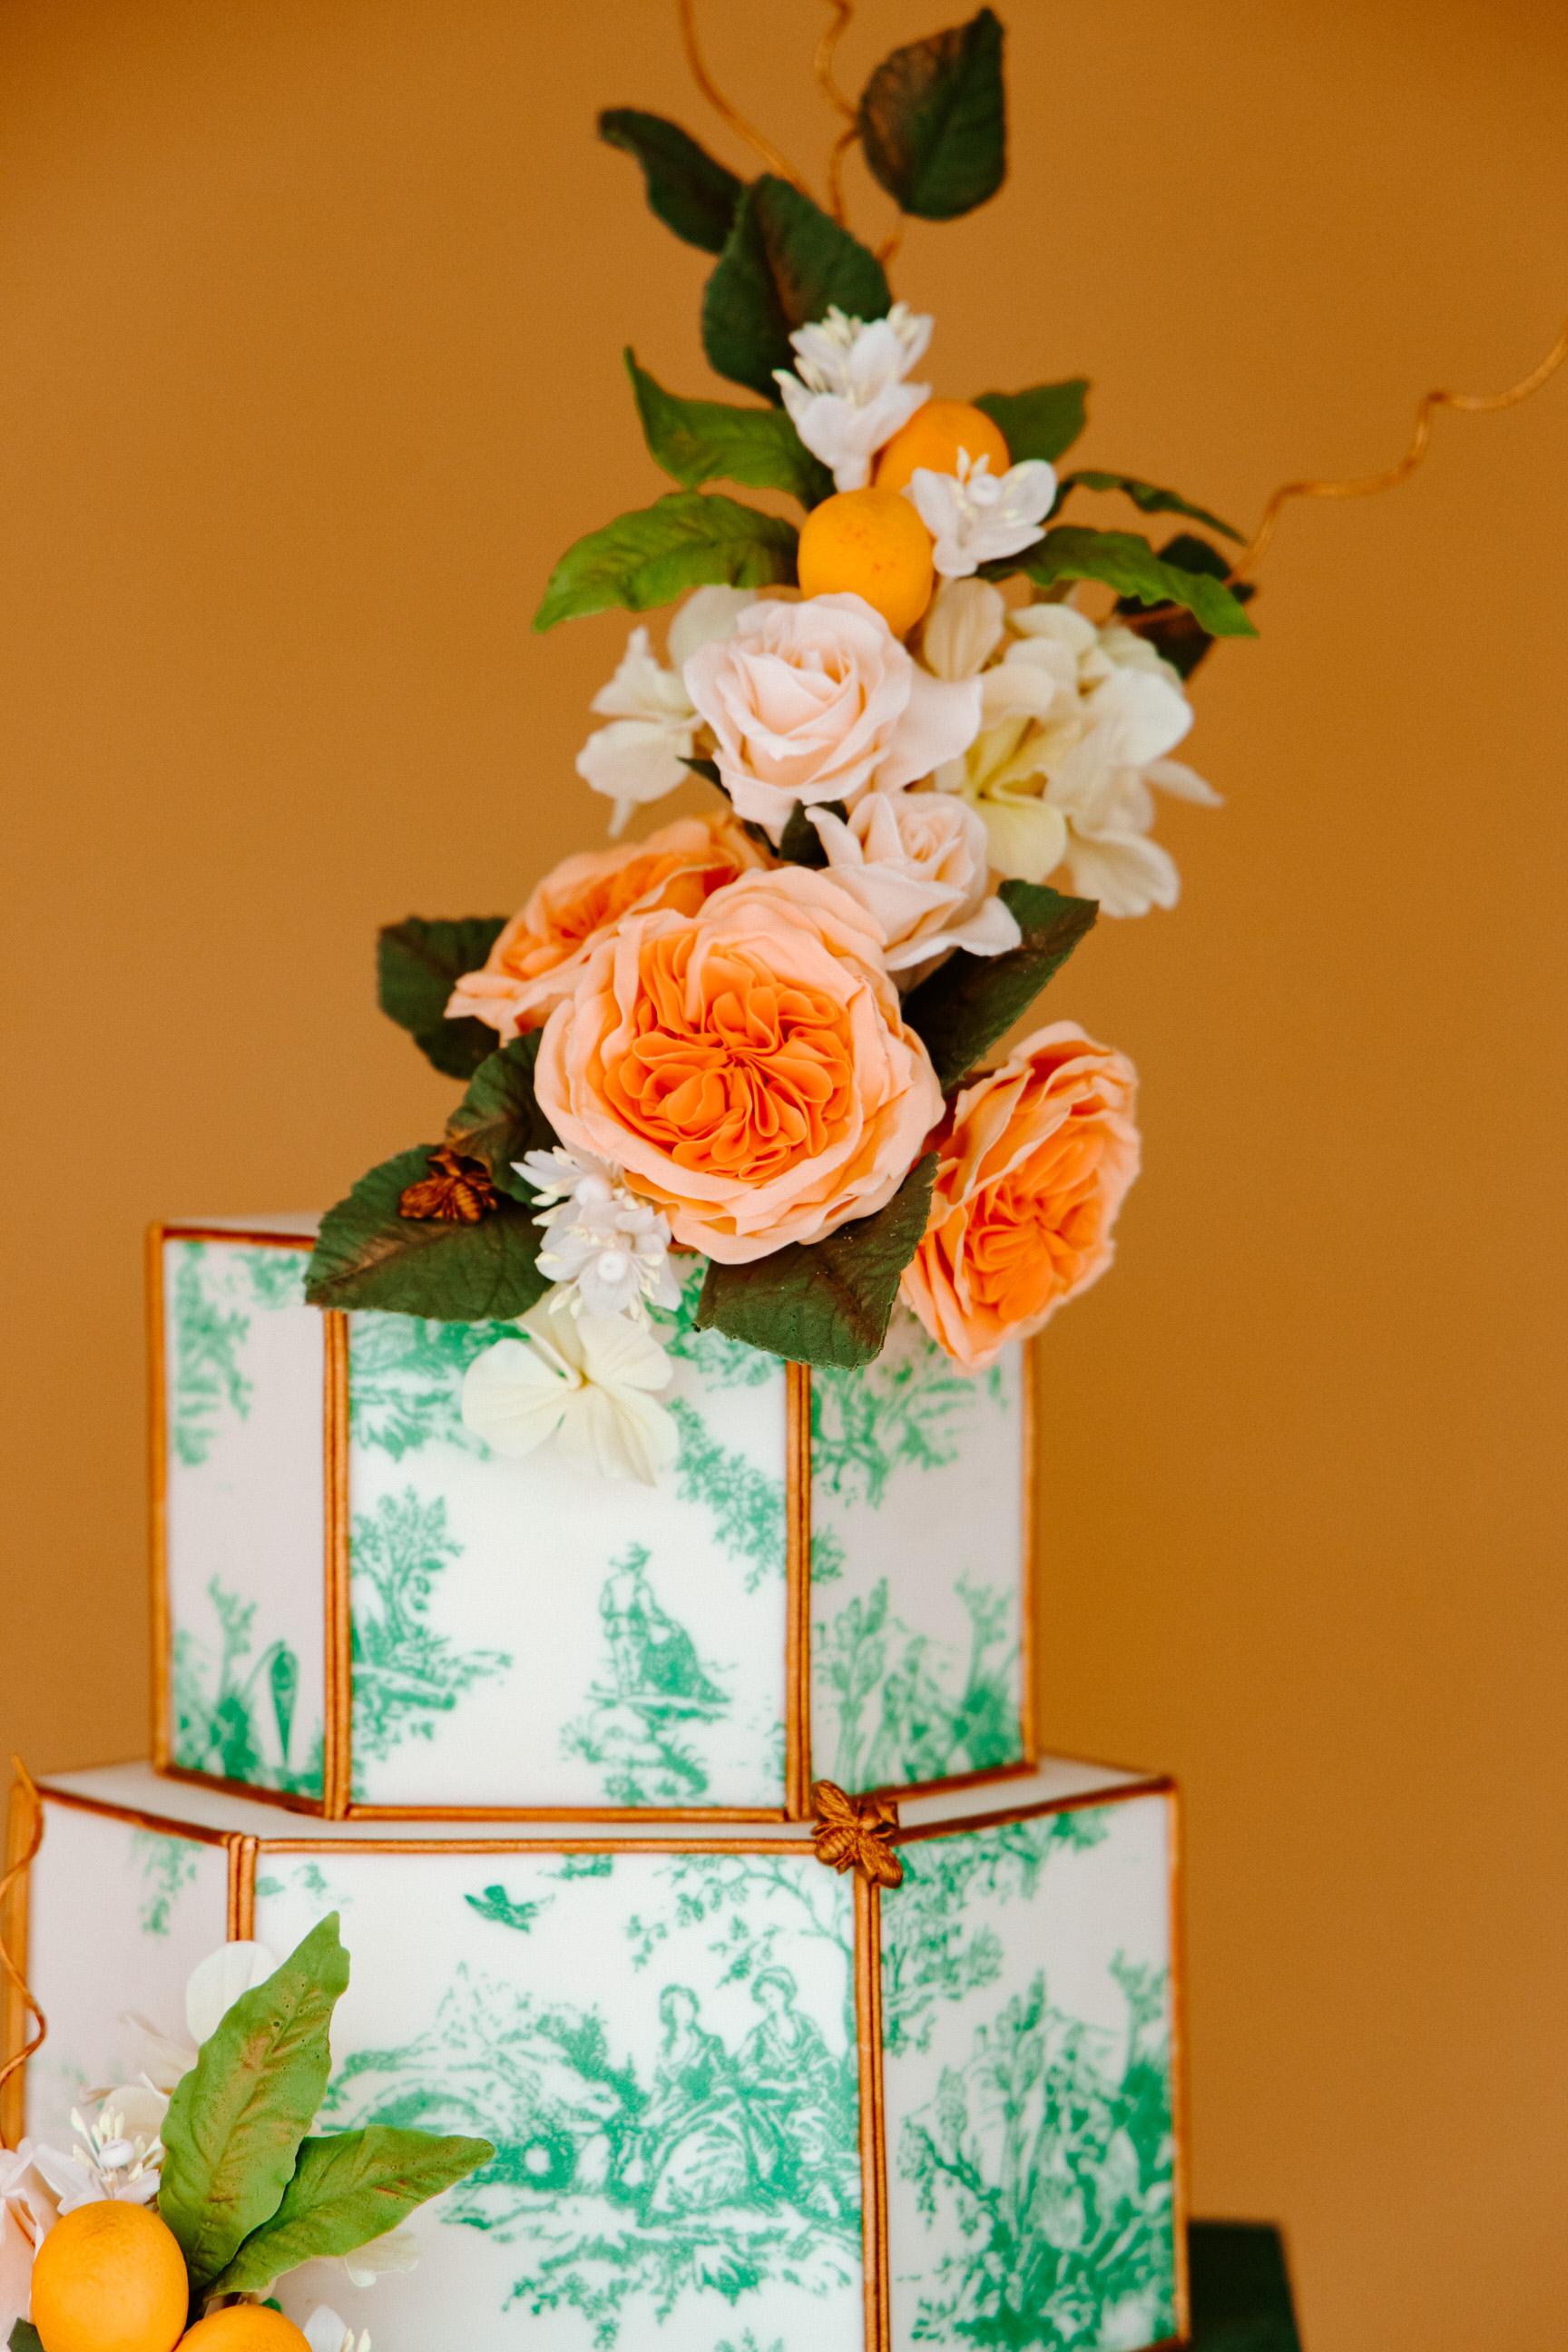 gateaux-cake-7390.jpg